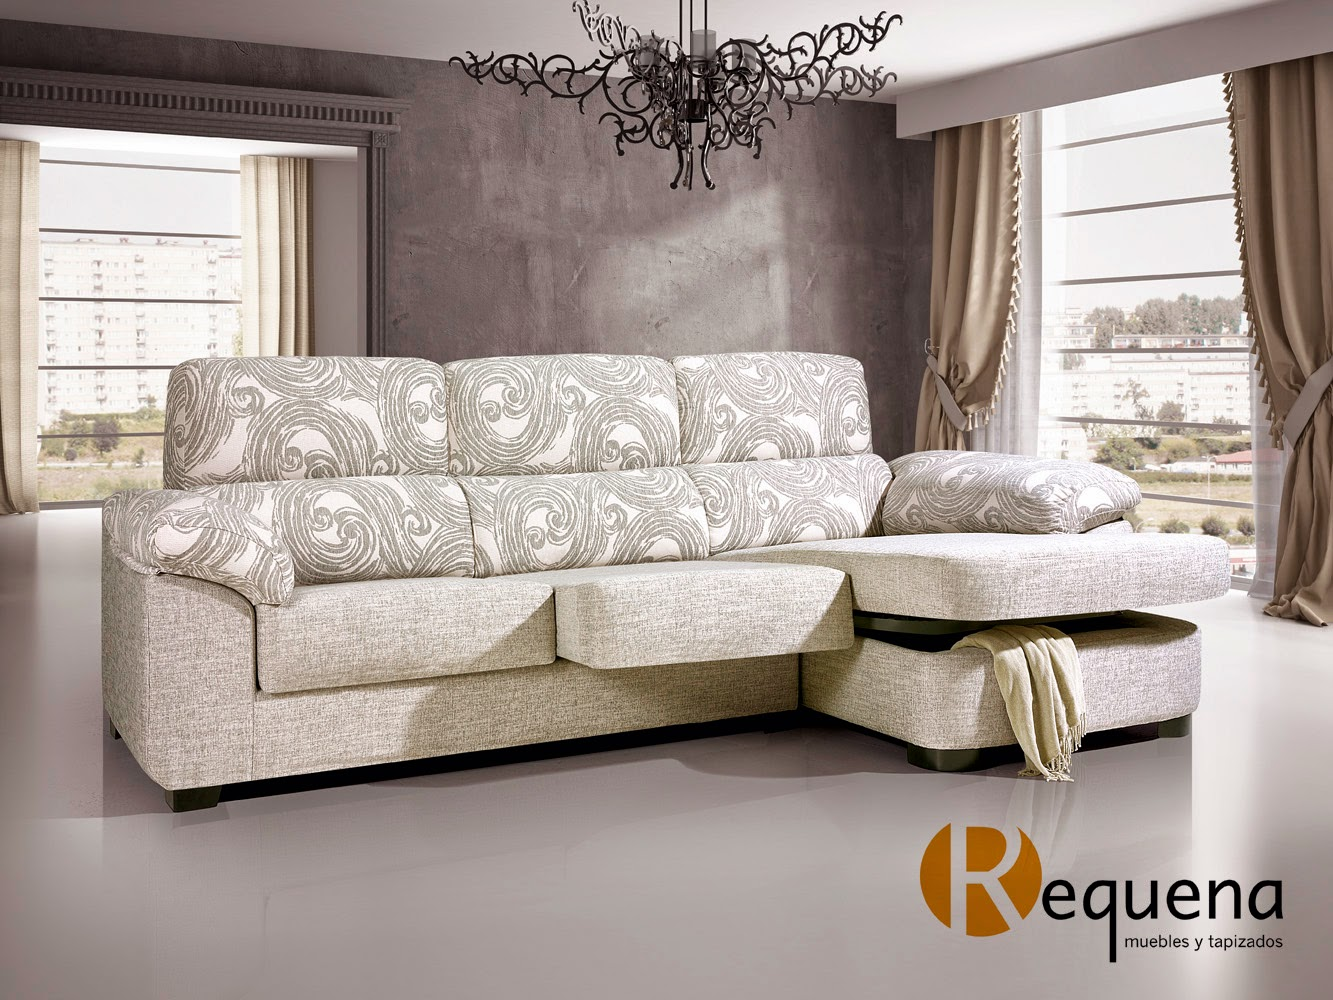 Muebles y tapizados requena liso o estampado c mo - Sofas tapizados en tela ...